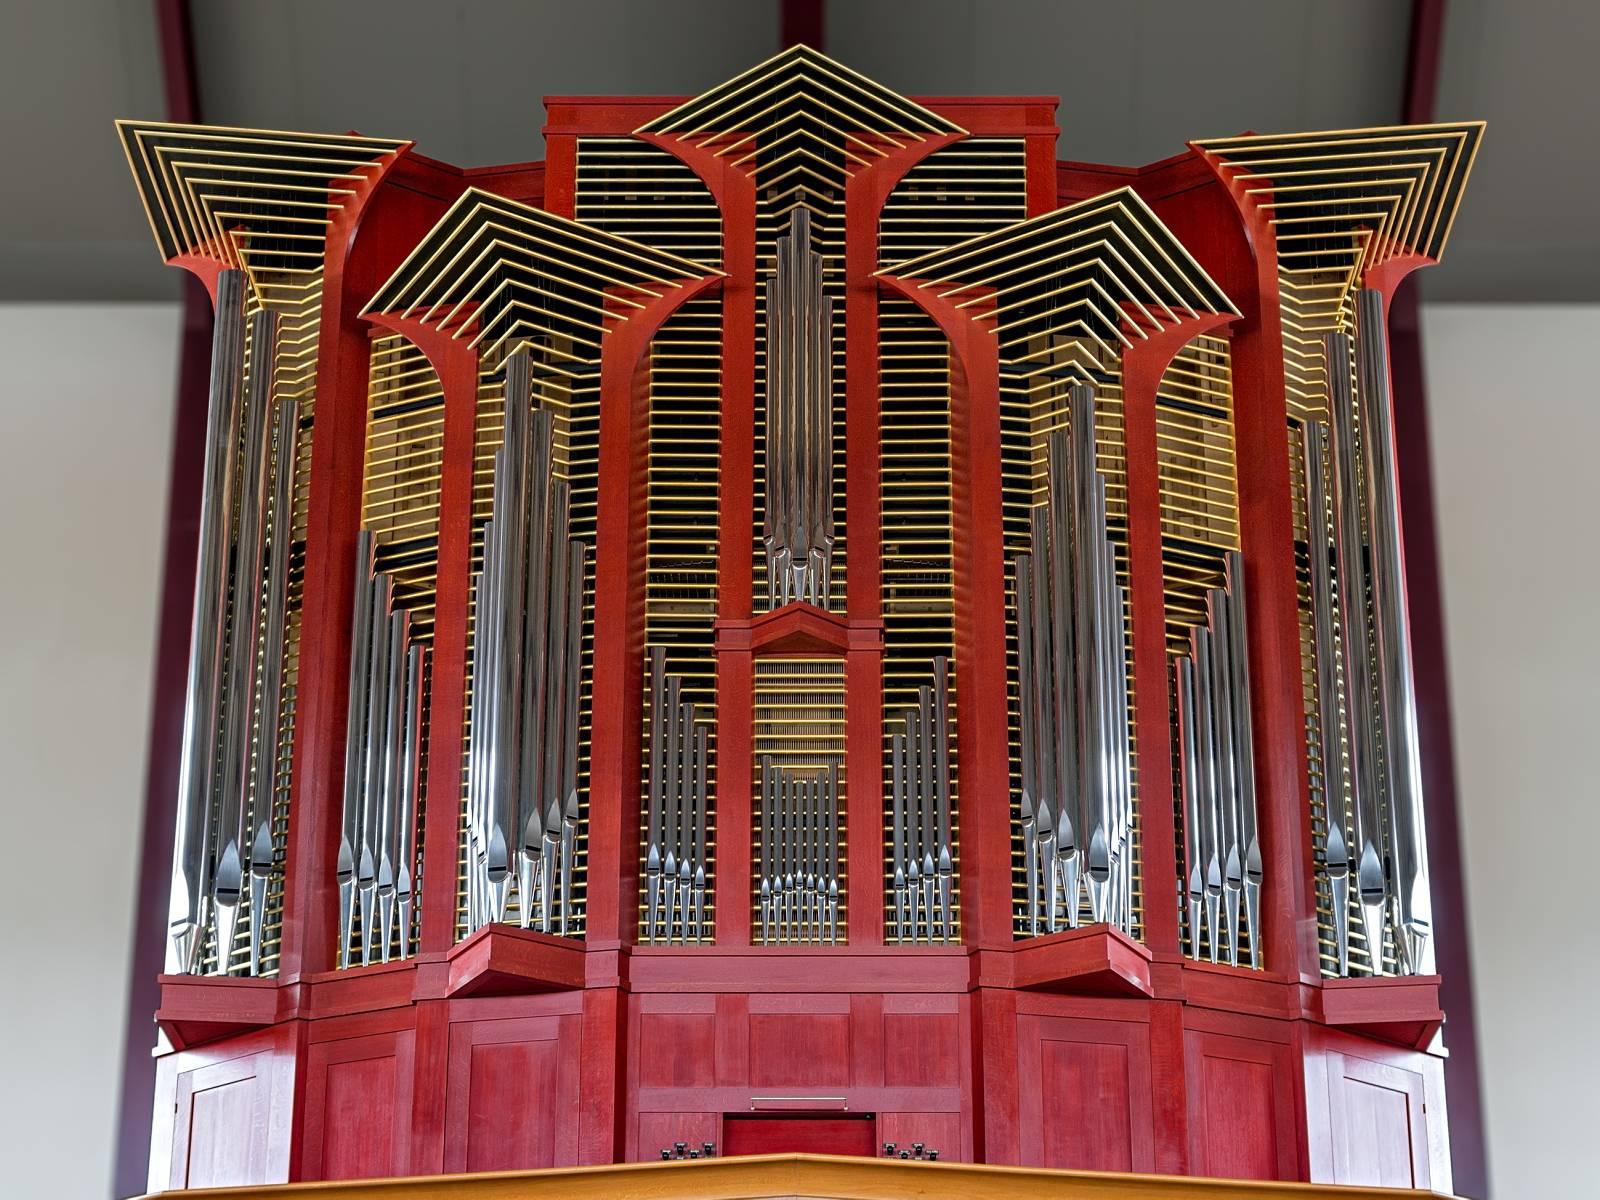 Orgel Ger Gem Barneveld-Zuid